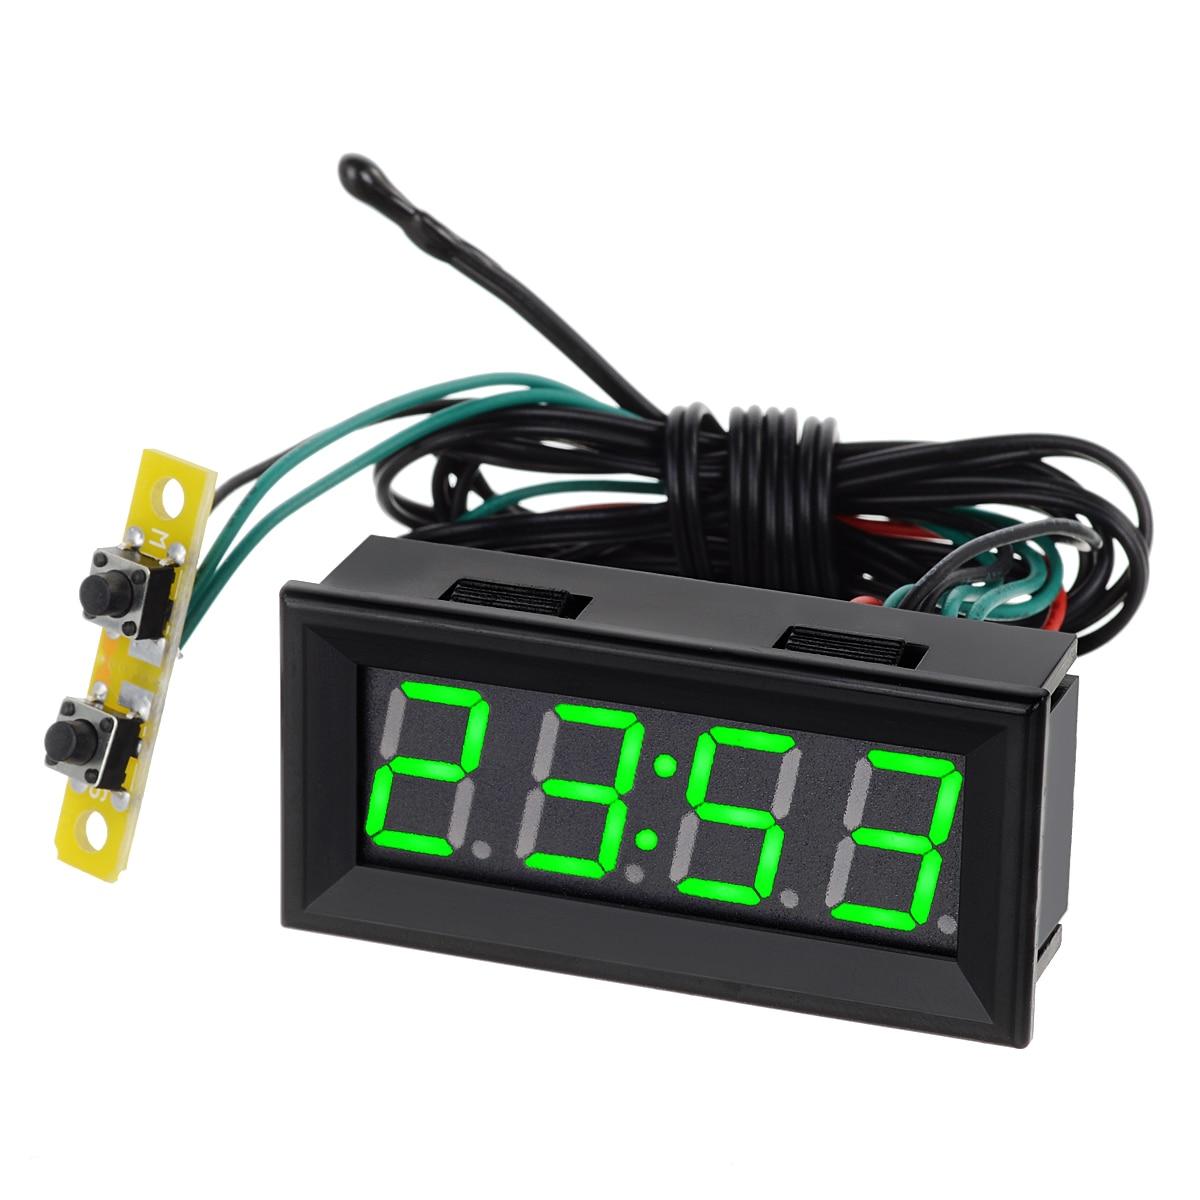 0 56 Green LED Clock Voltage Temperature 12V Digital Display Thermometer Voltmeter Electrical Test Meters Digital